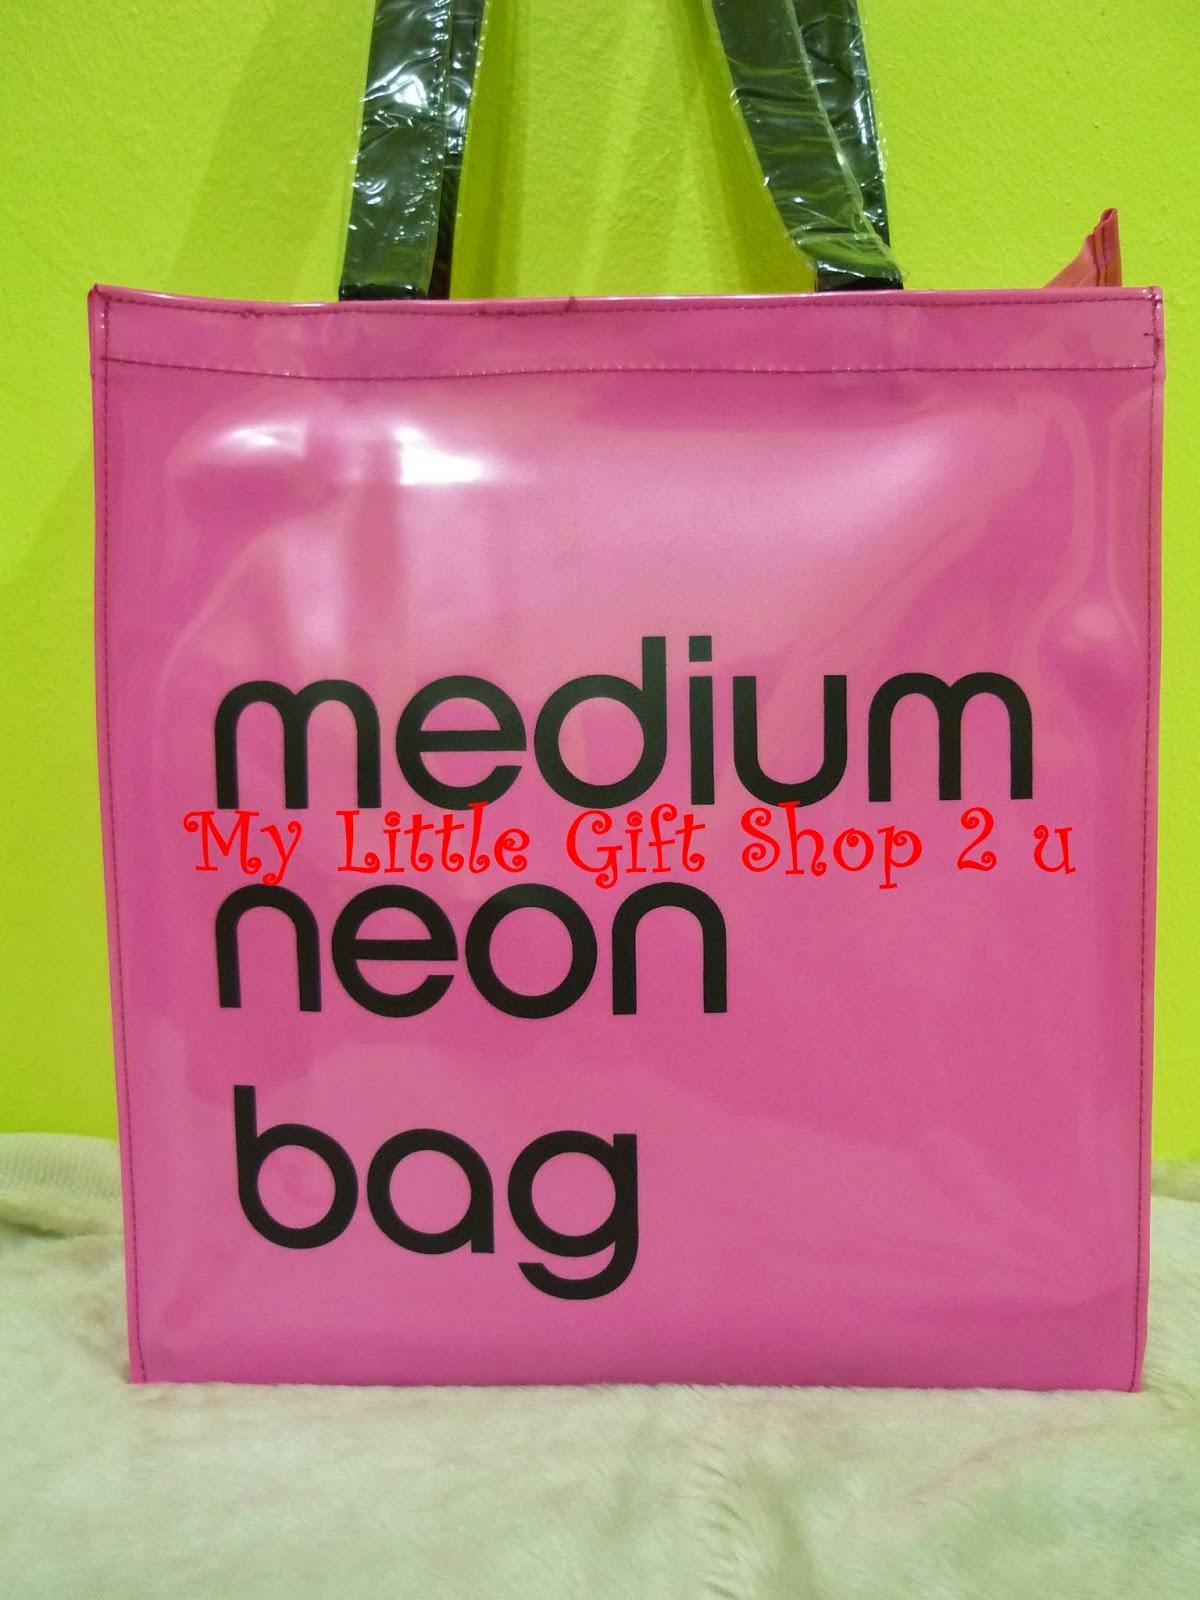 Medium Neon Bag Medium Neon Bag Pink